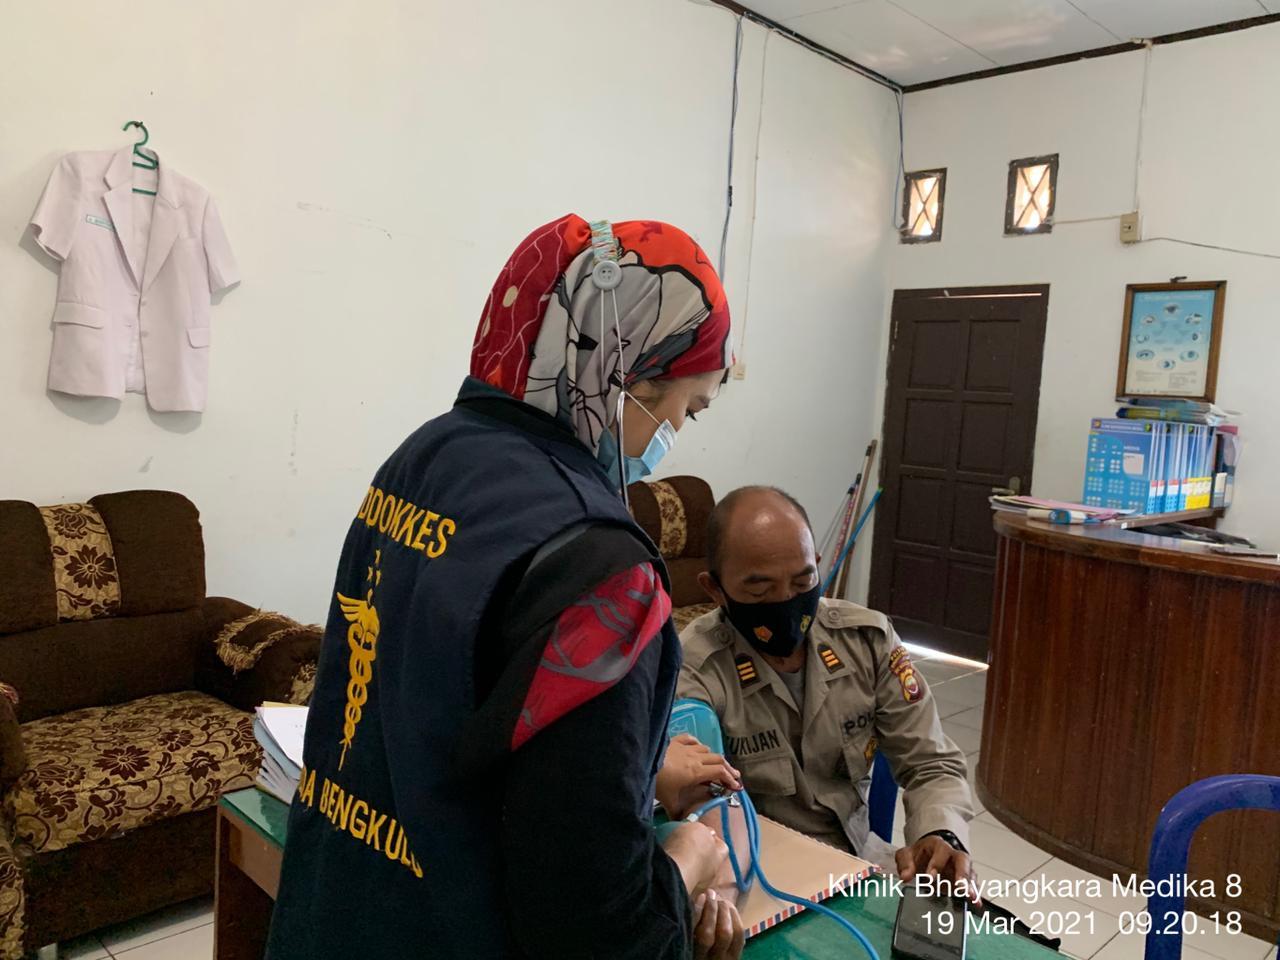 Pelayanan Kesehatan, Urkes Polres BS Gelar Pemeriksaan dan Pengobatan Awal